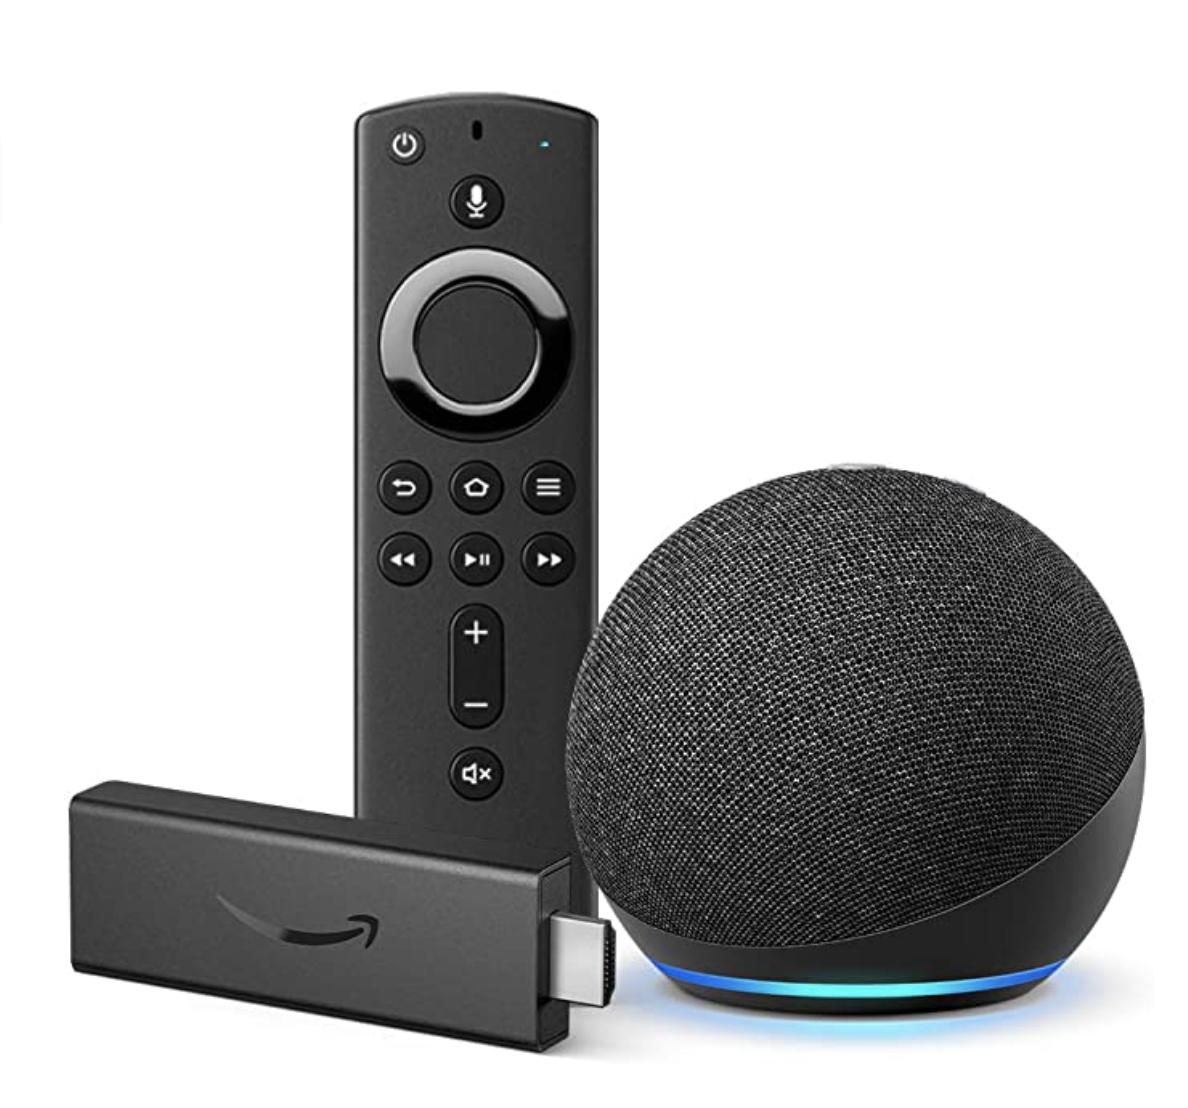 A Fire stick, remote, and circular Echo Dot